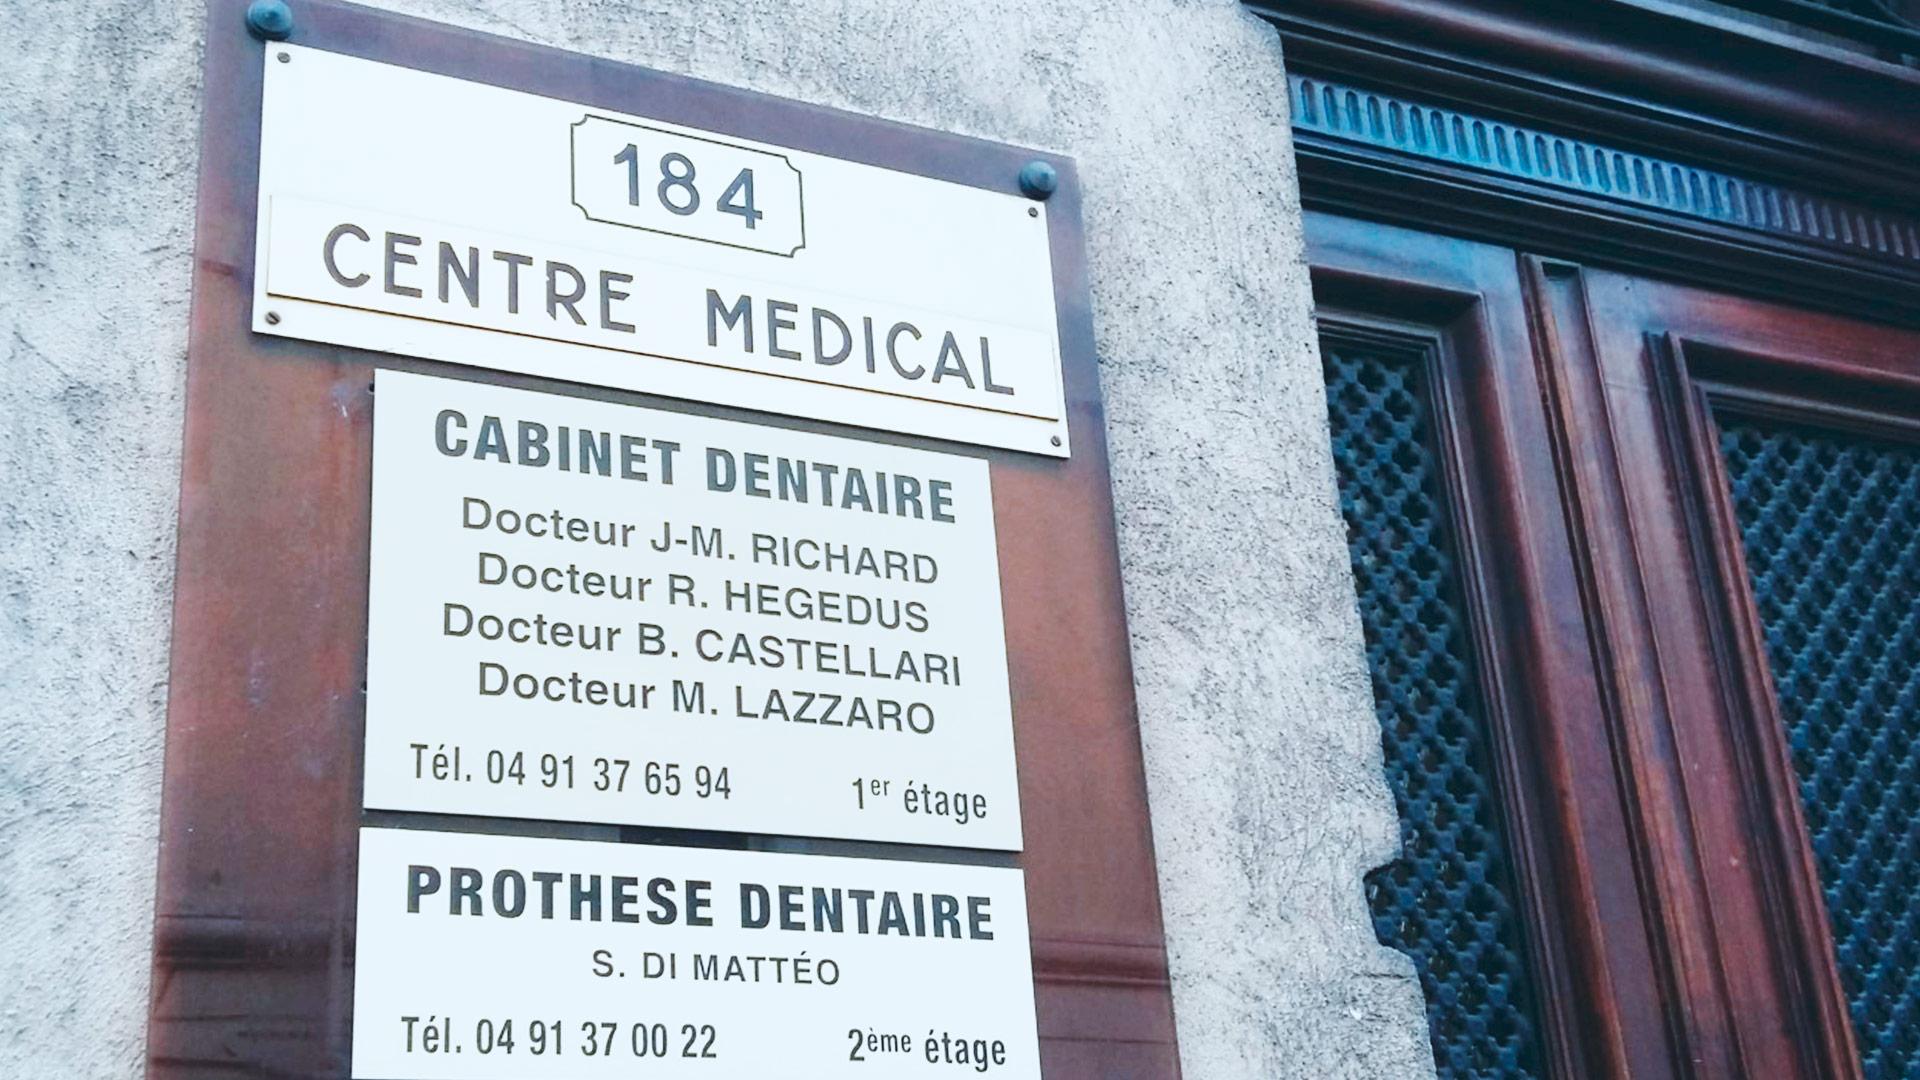 Cabinet dentaire marseille - Cabinet nicolas marseille ...